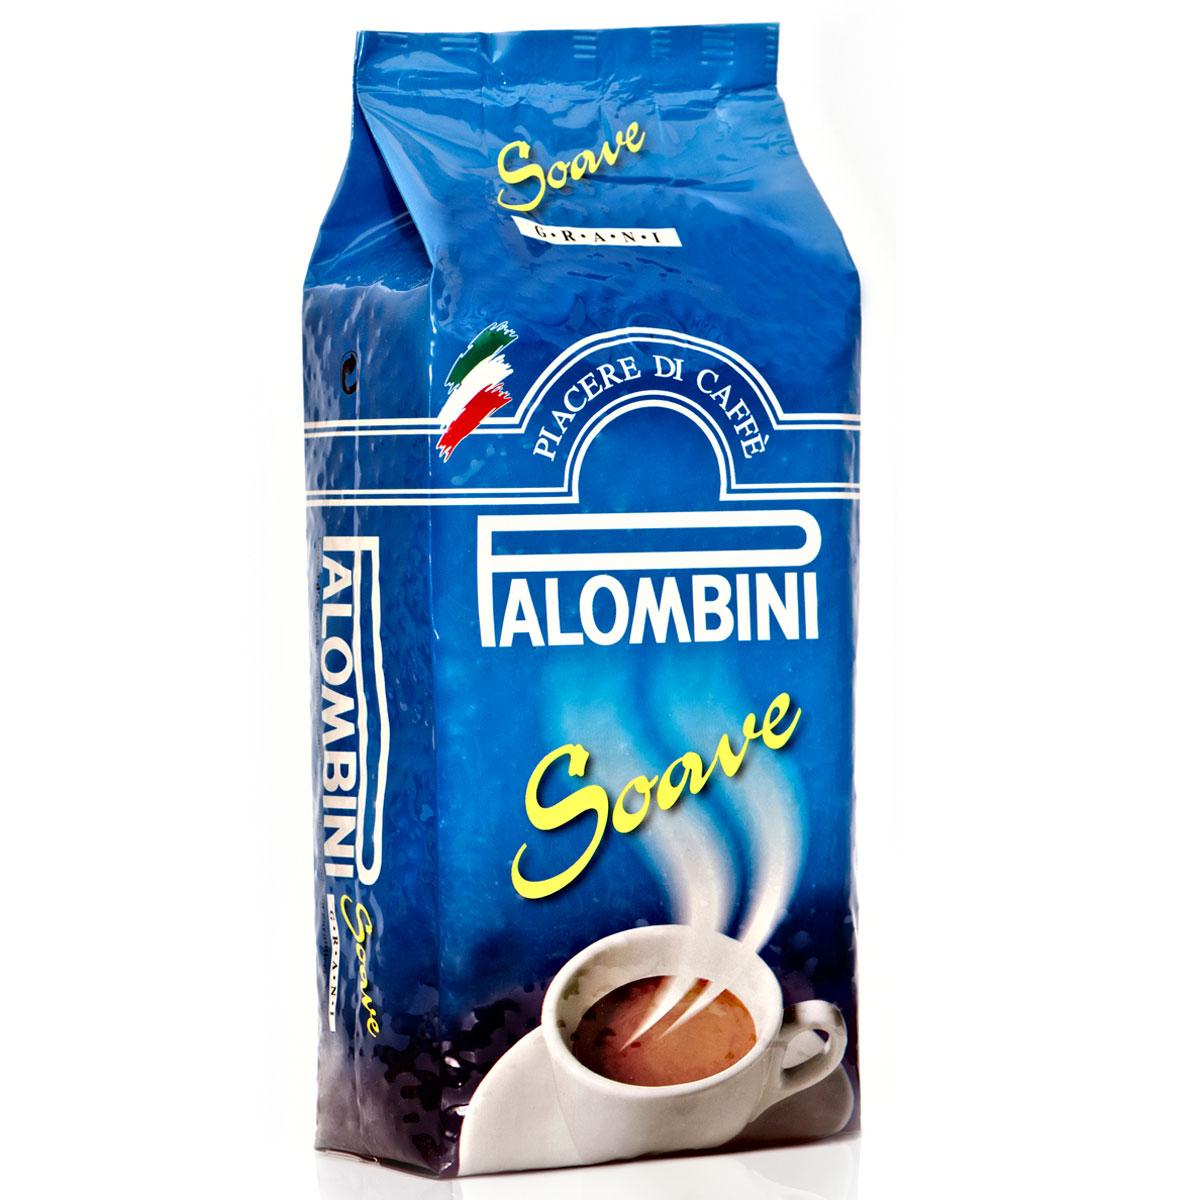 Palombini Soave кофе в зернах, 1 кг palombini pal oro